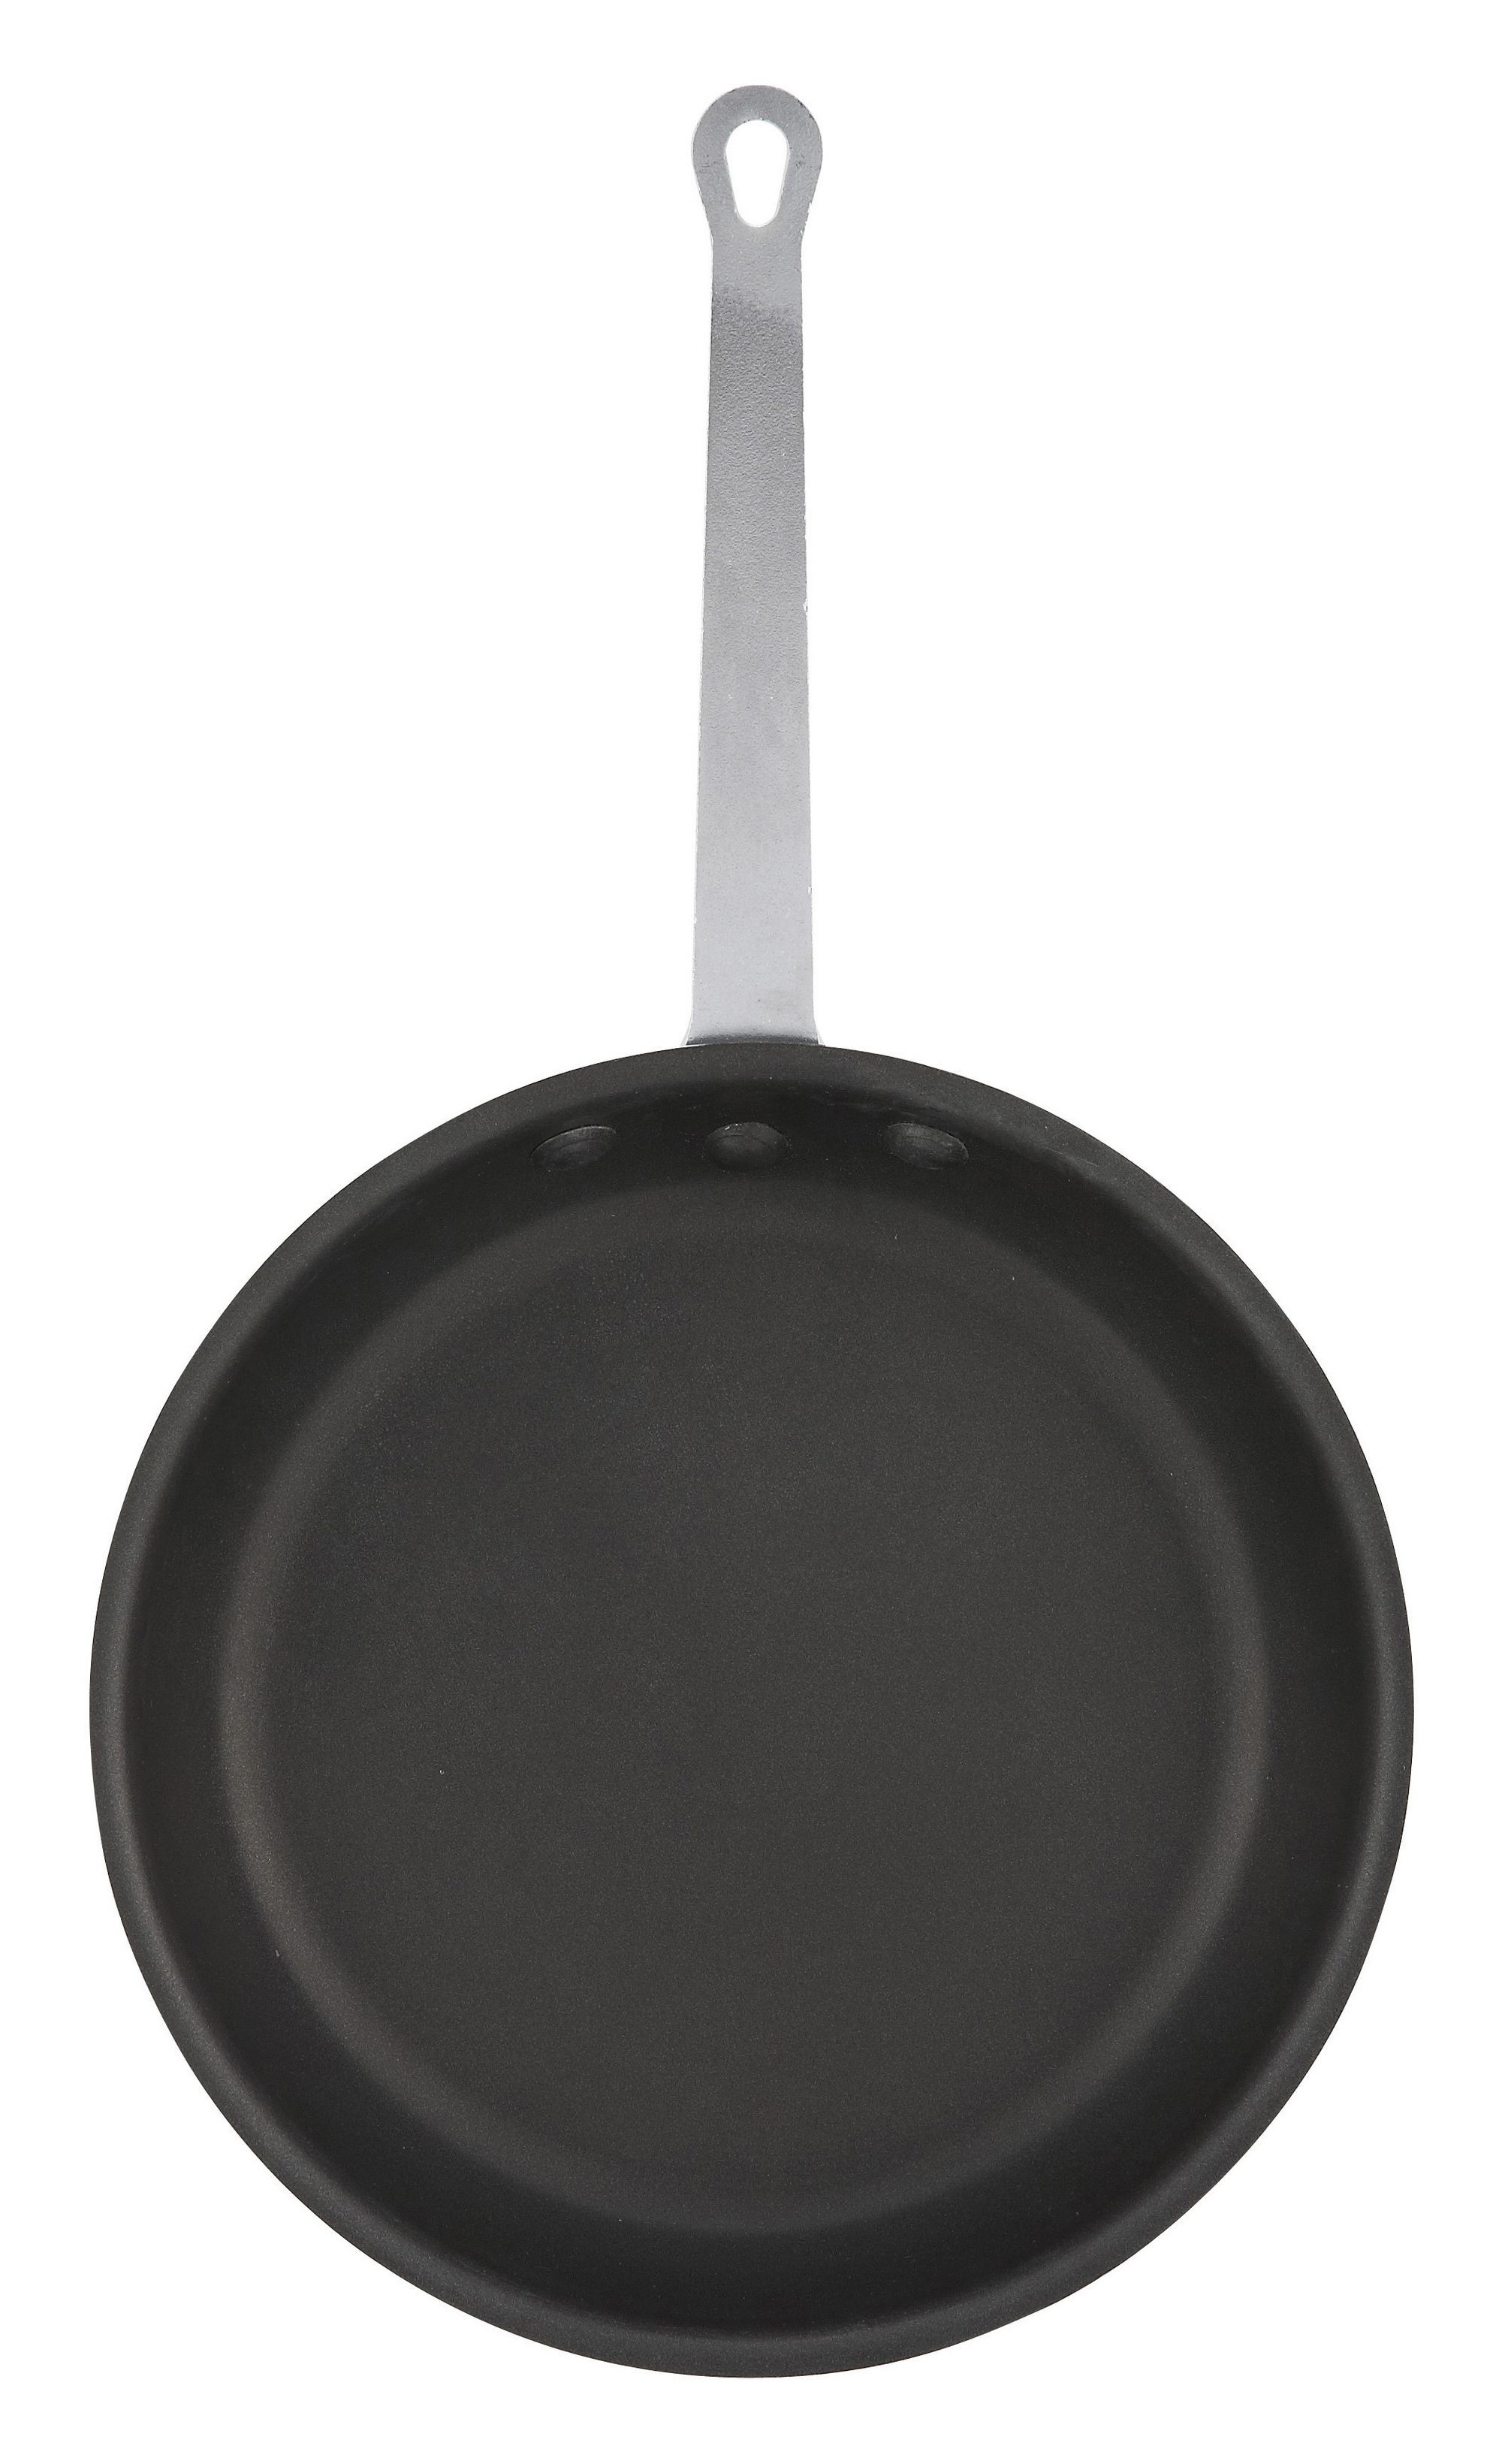 Winco afp-10ns 10 3.5 mm Aluminum Non-Stick Fry Pan